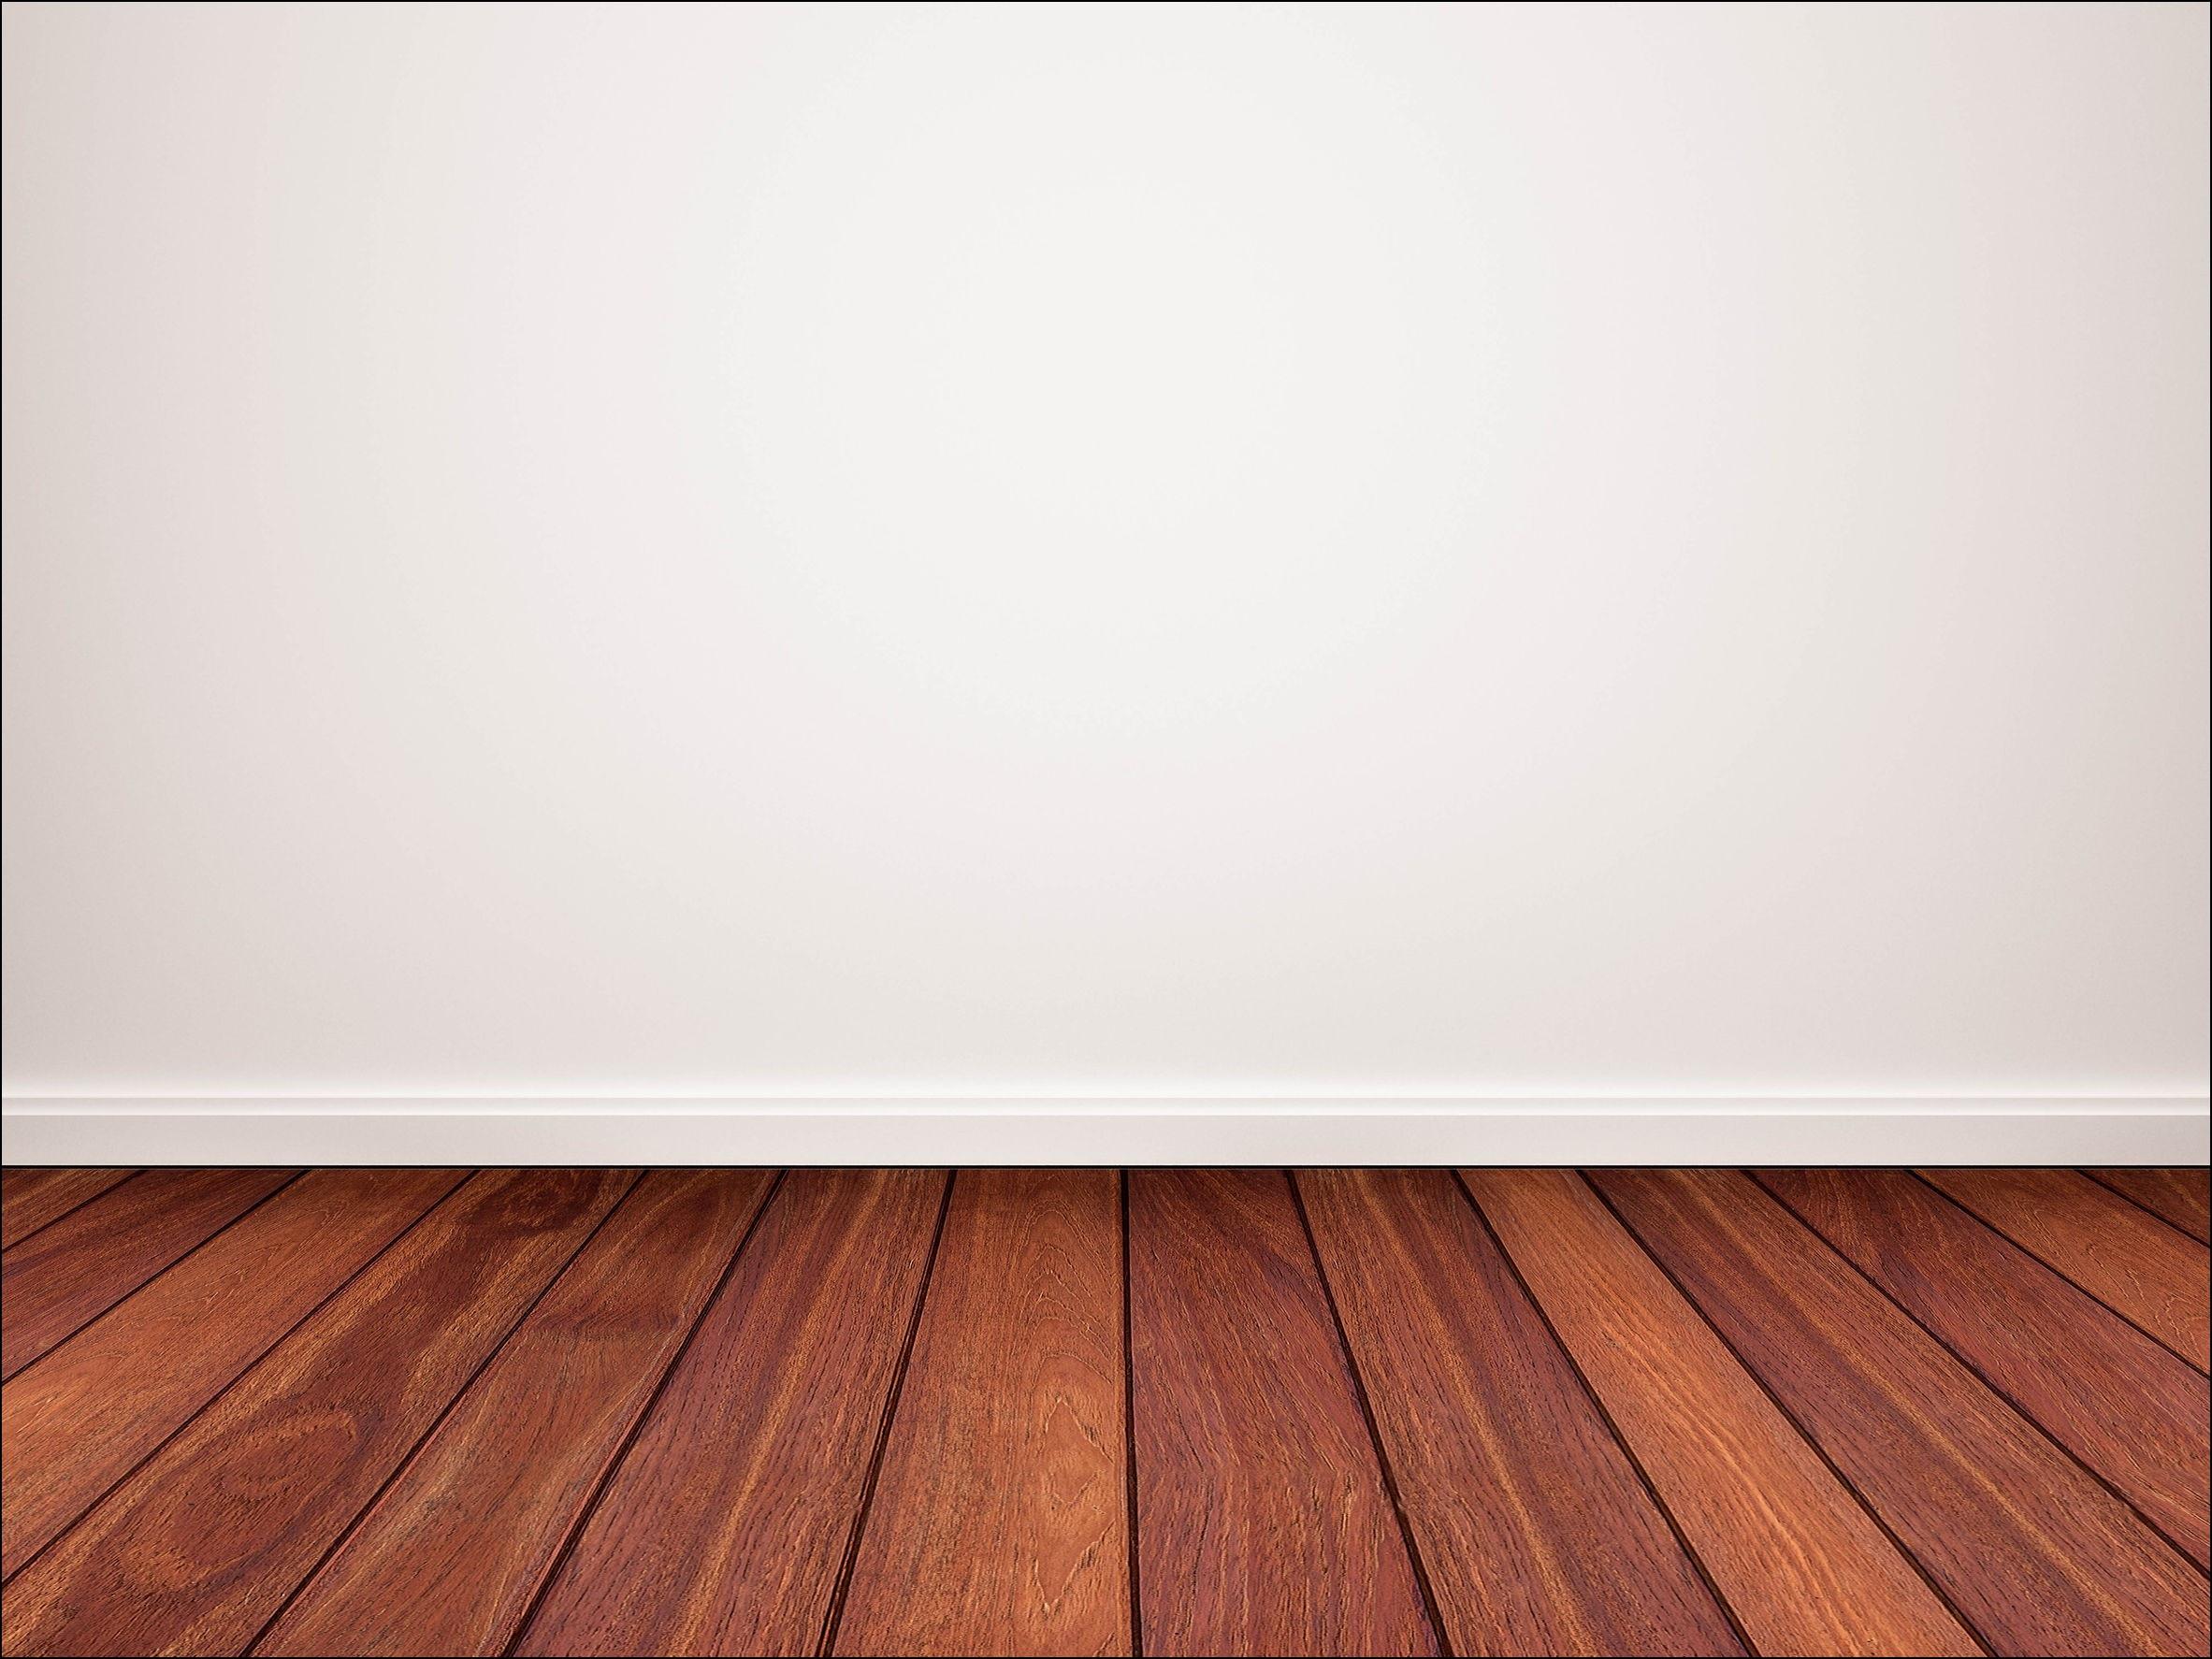 new dimension hardwood floors eugene or of brazilian cherry hardwood flooring for sale flooring ideas intended for brazilian cherry hardwood flooring for sale images brazilian cherry hardwood floor beautiful cherry floors home design